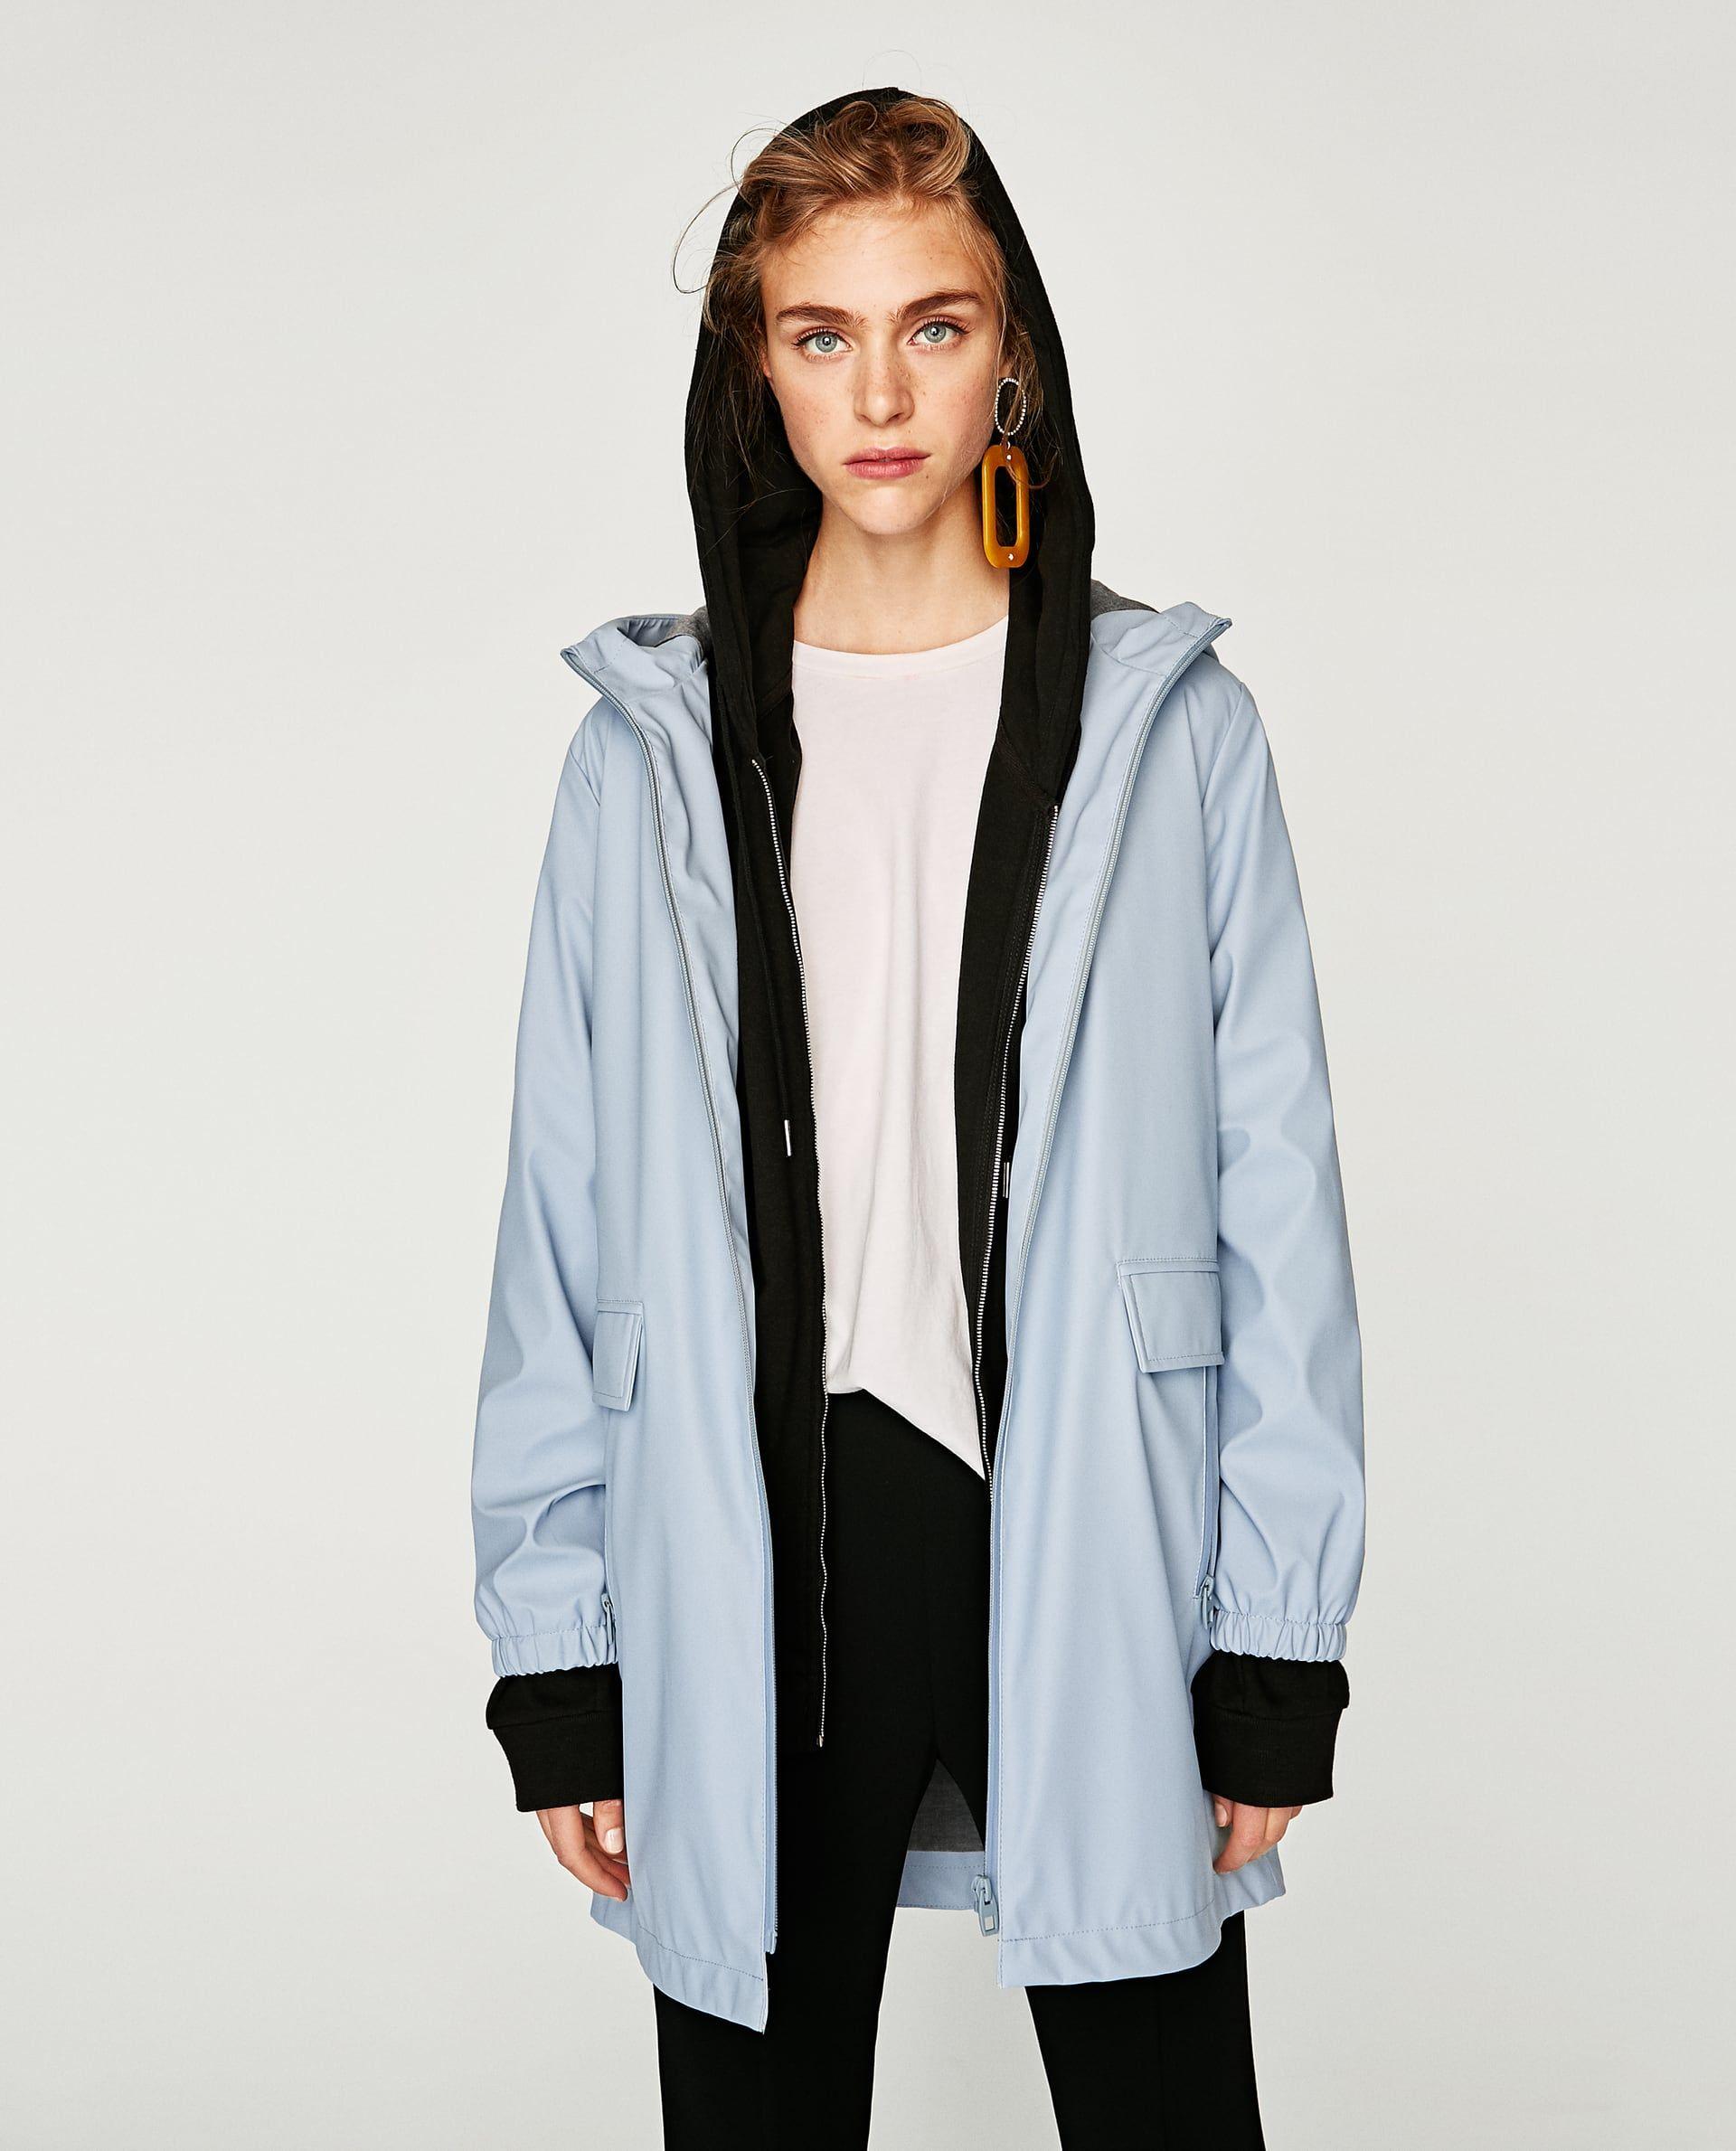 cute spring raincoats - best raincoats for women